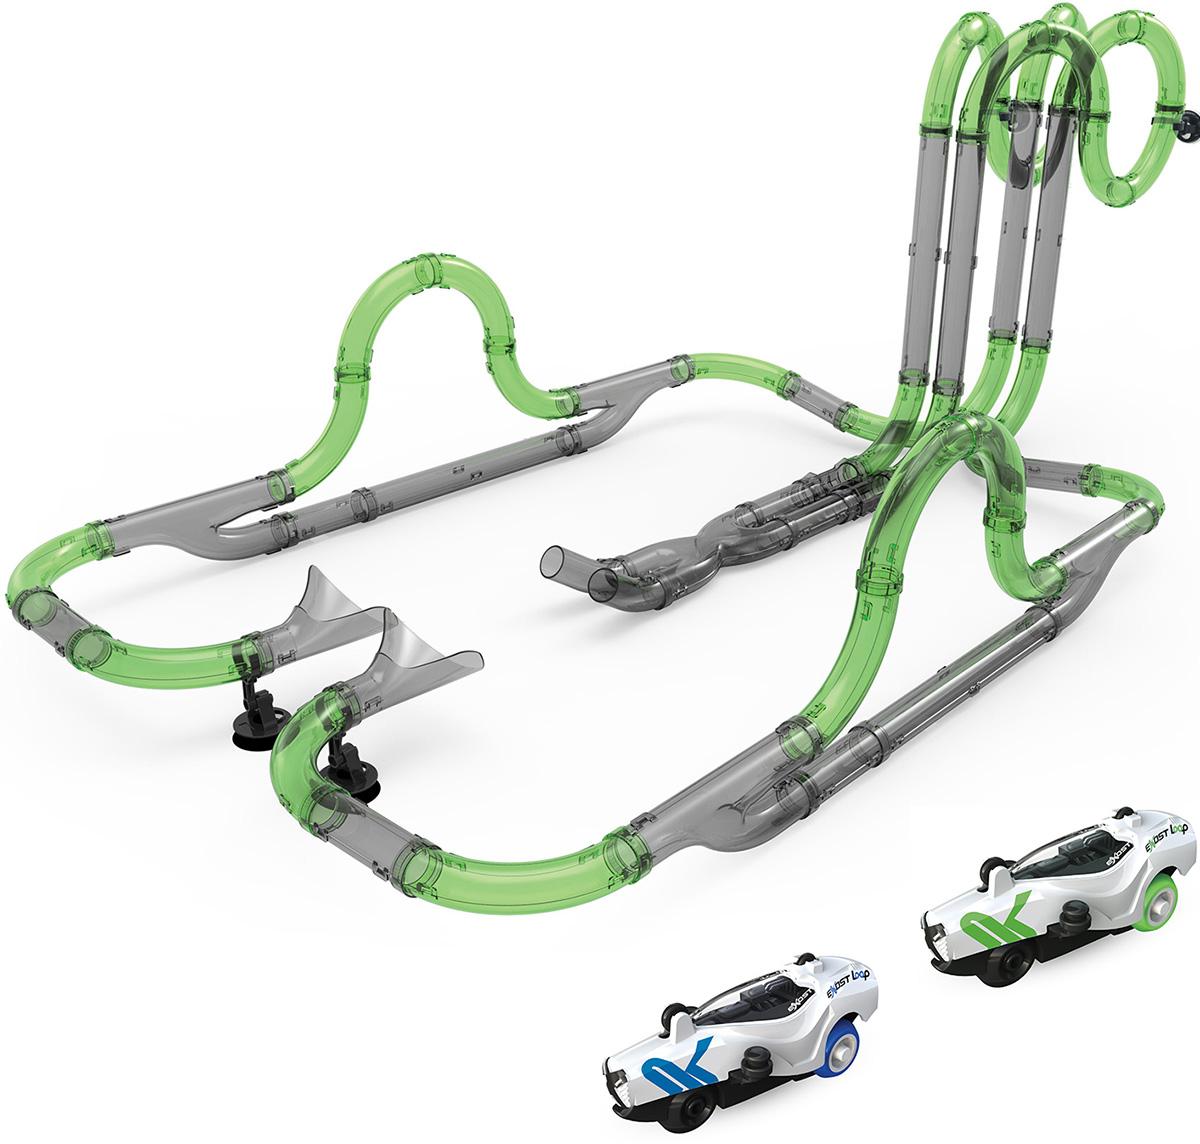 Игровой набор Silverlit Exost Loop. Супер делюкс набор, 20234 цена